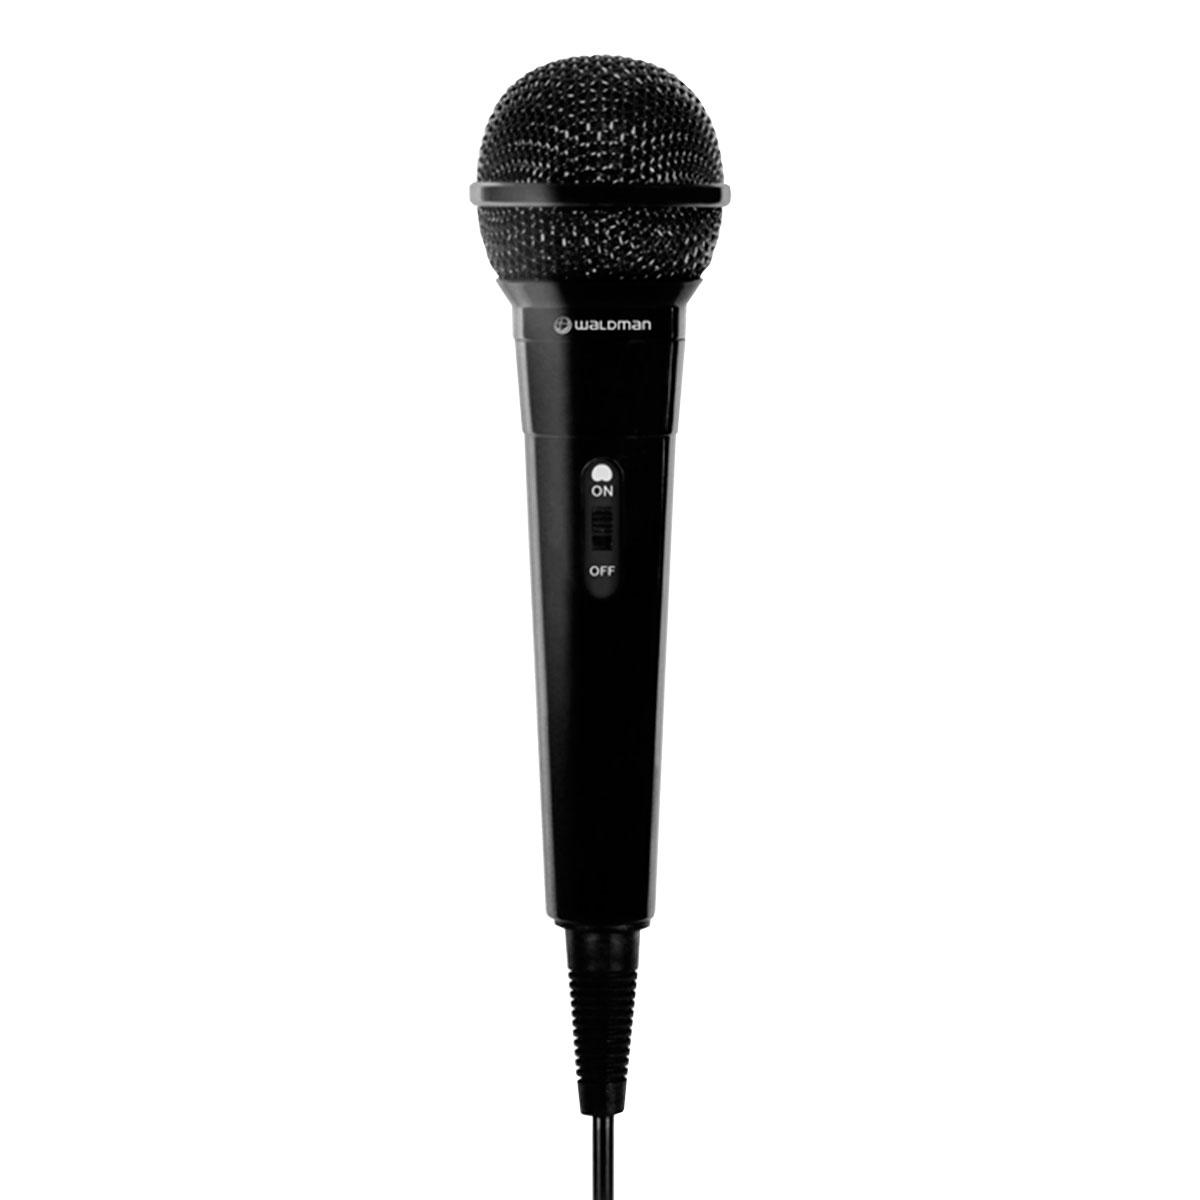 MIC100 - Microfone c/ Fio de Mão MIC 100 - Waldman